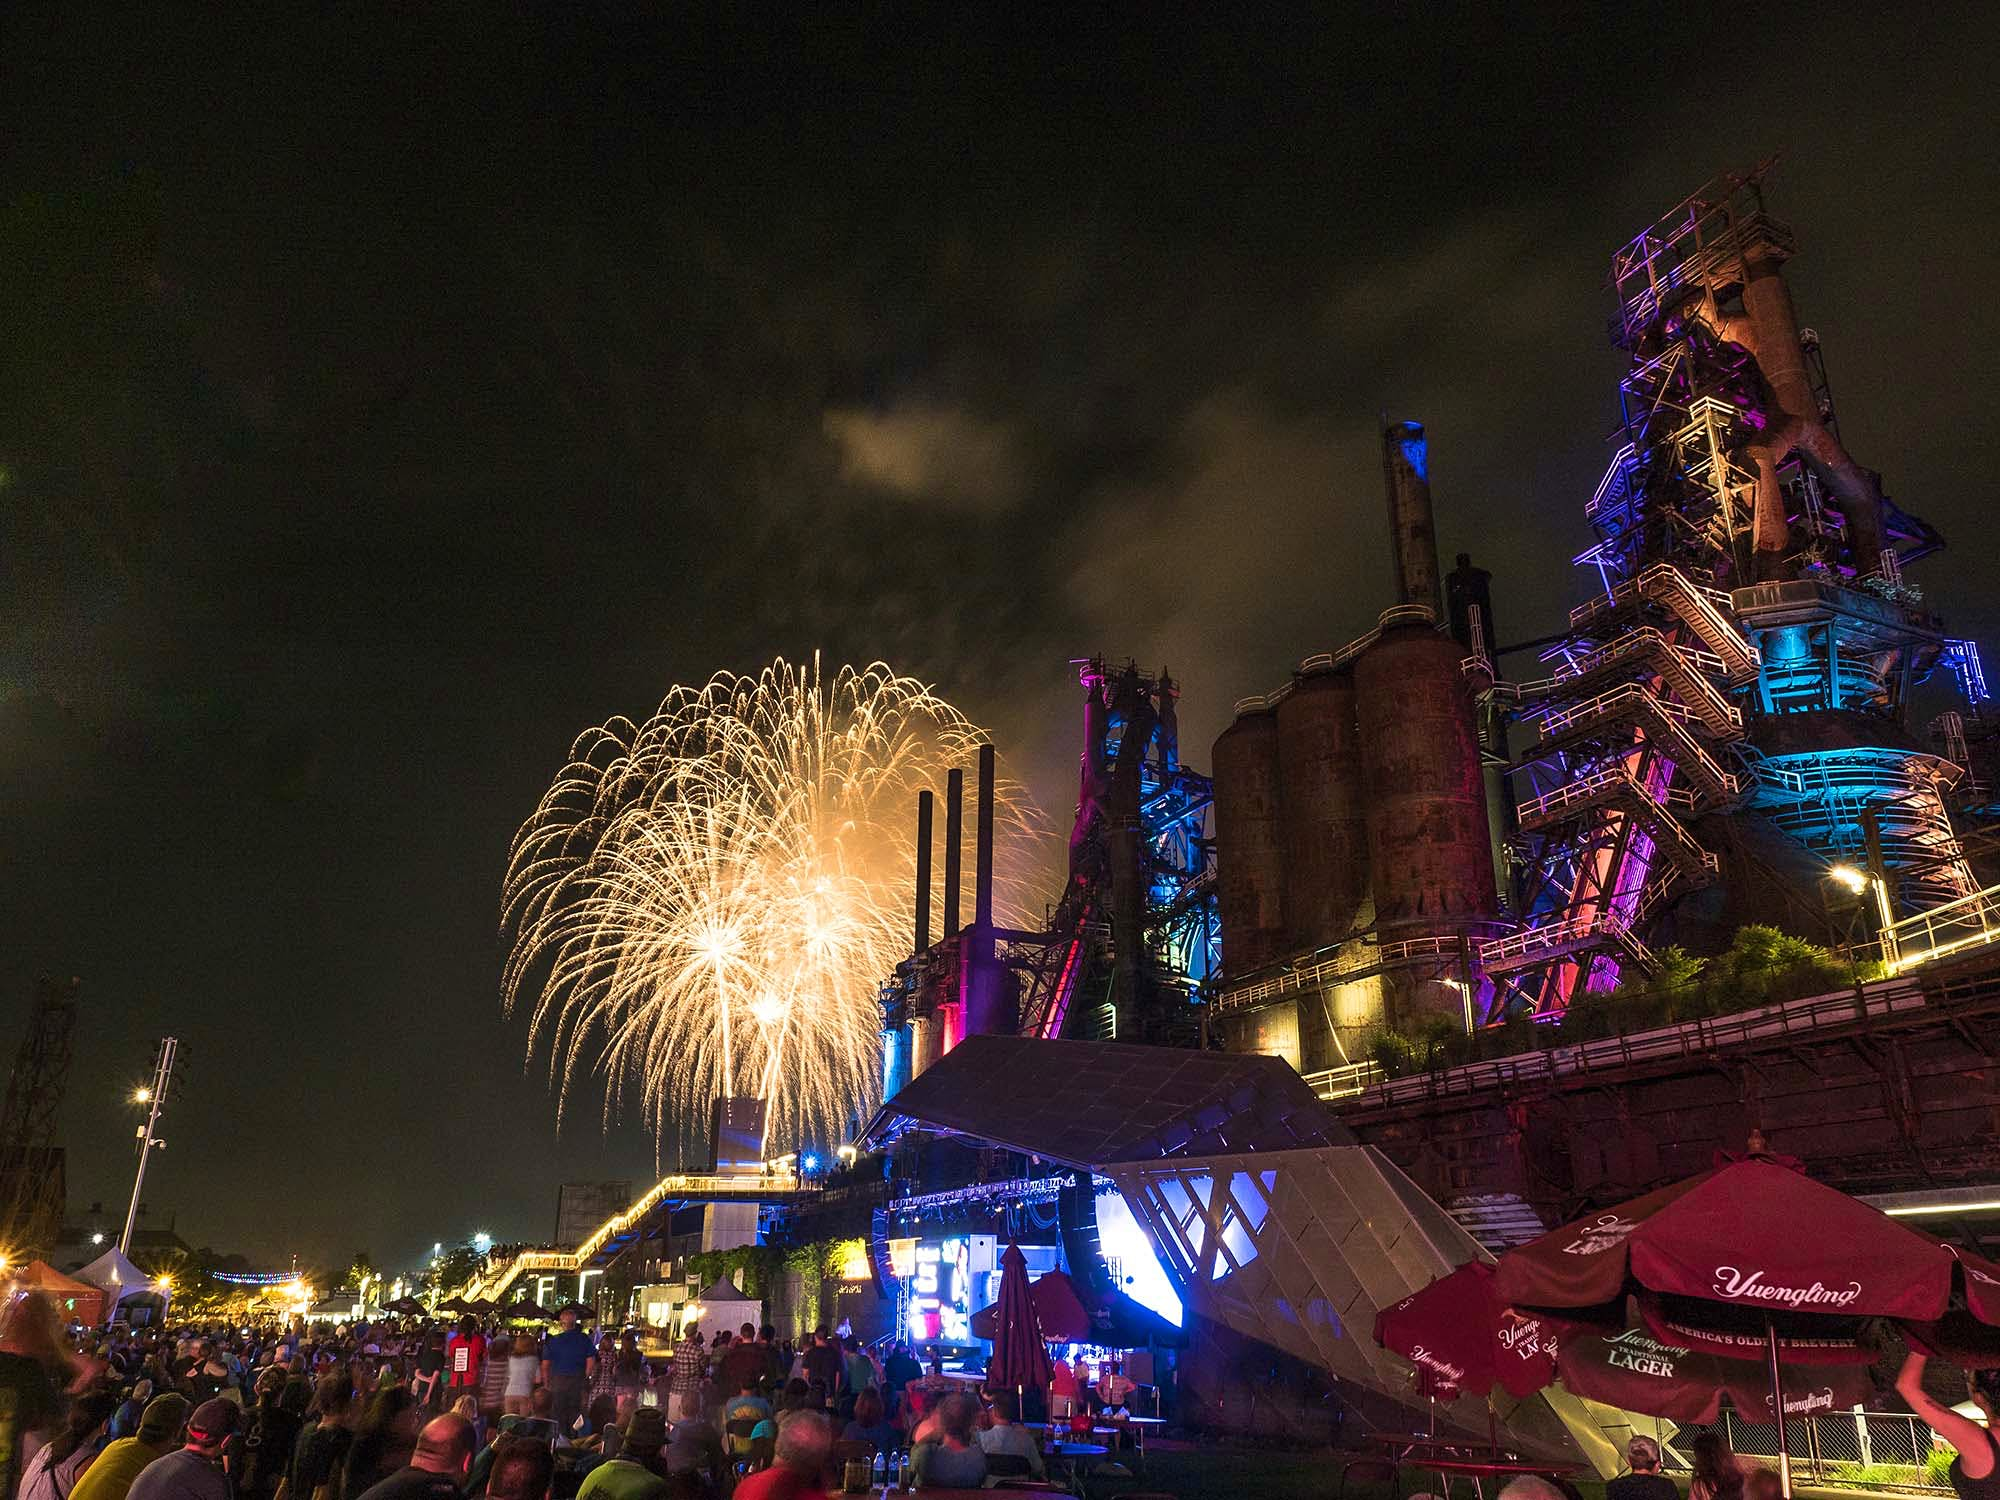 Musikfest kicks off on August 2